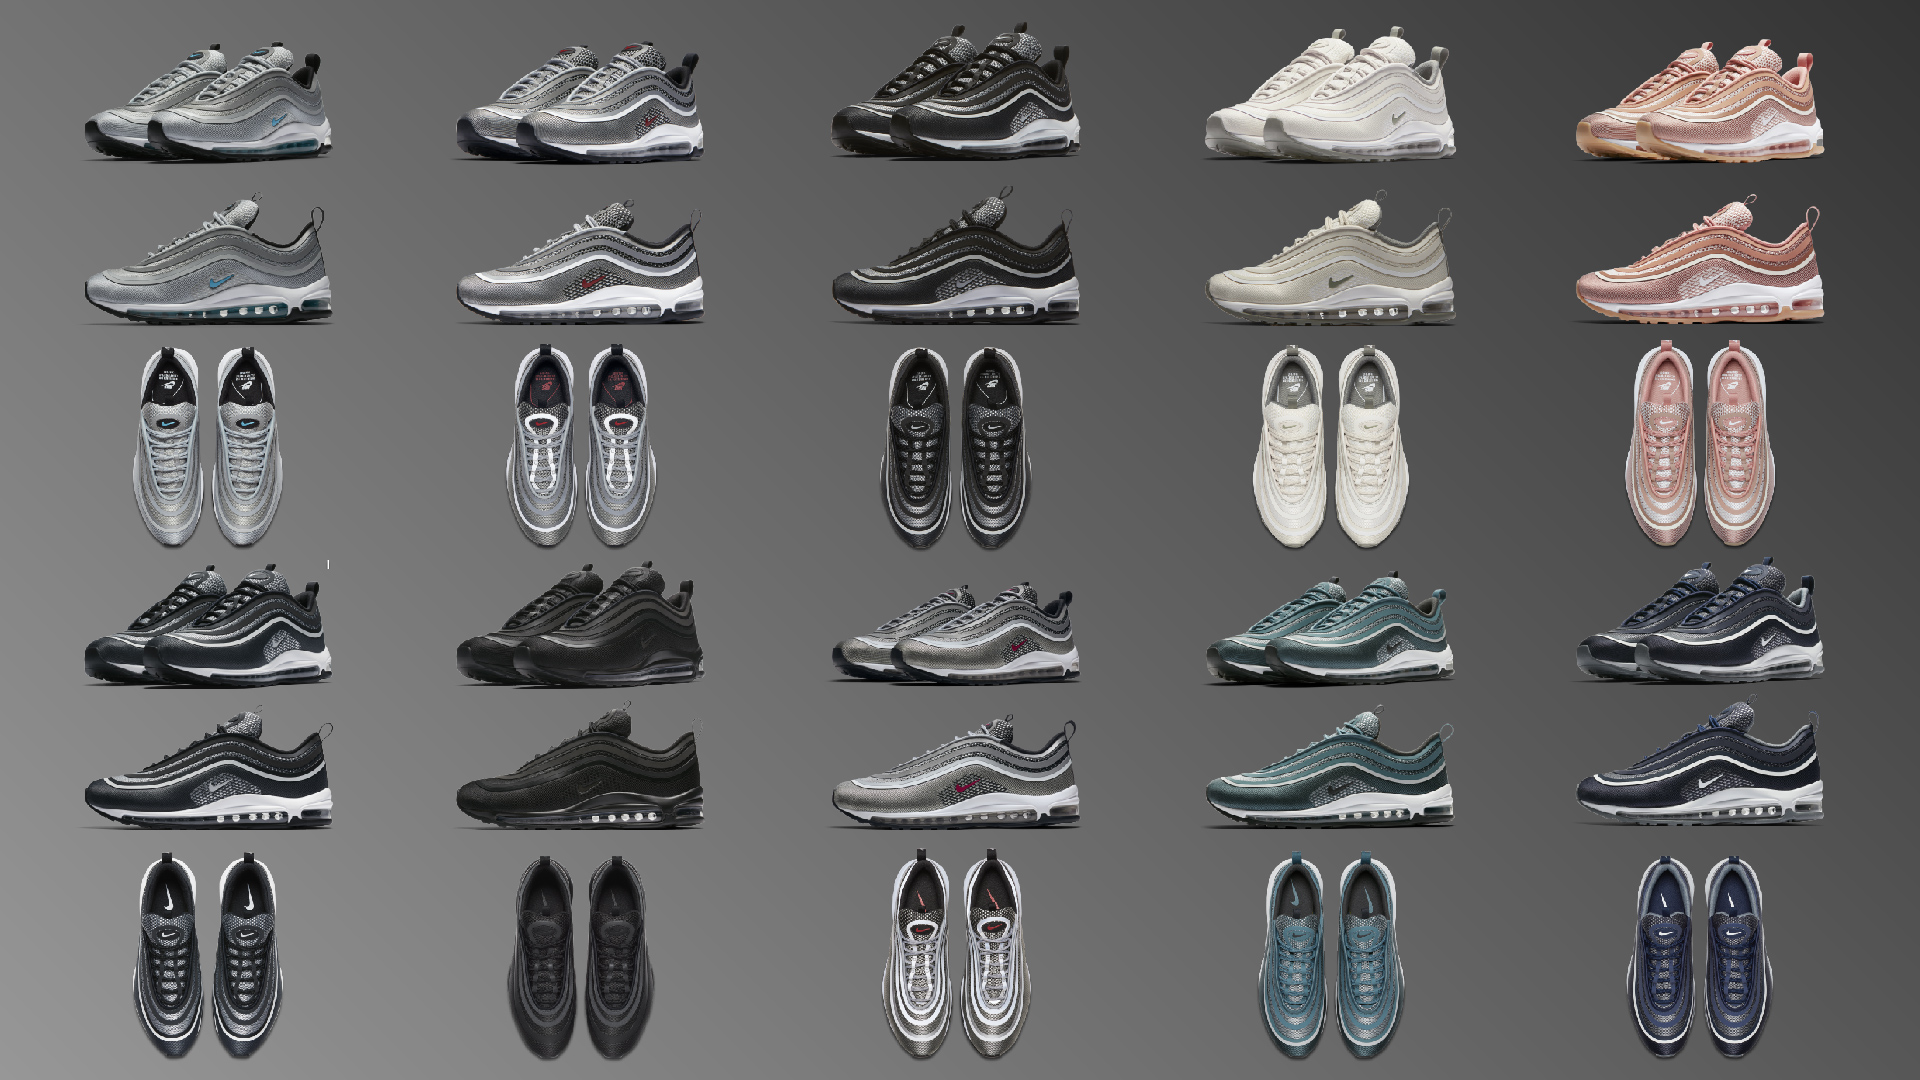 Release Dates Nike Air Max 97 Og Og Premium Ultra Eu Kicks